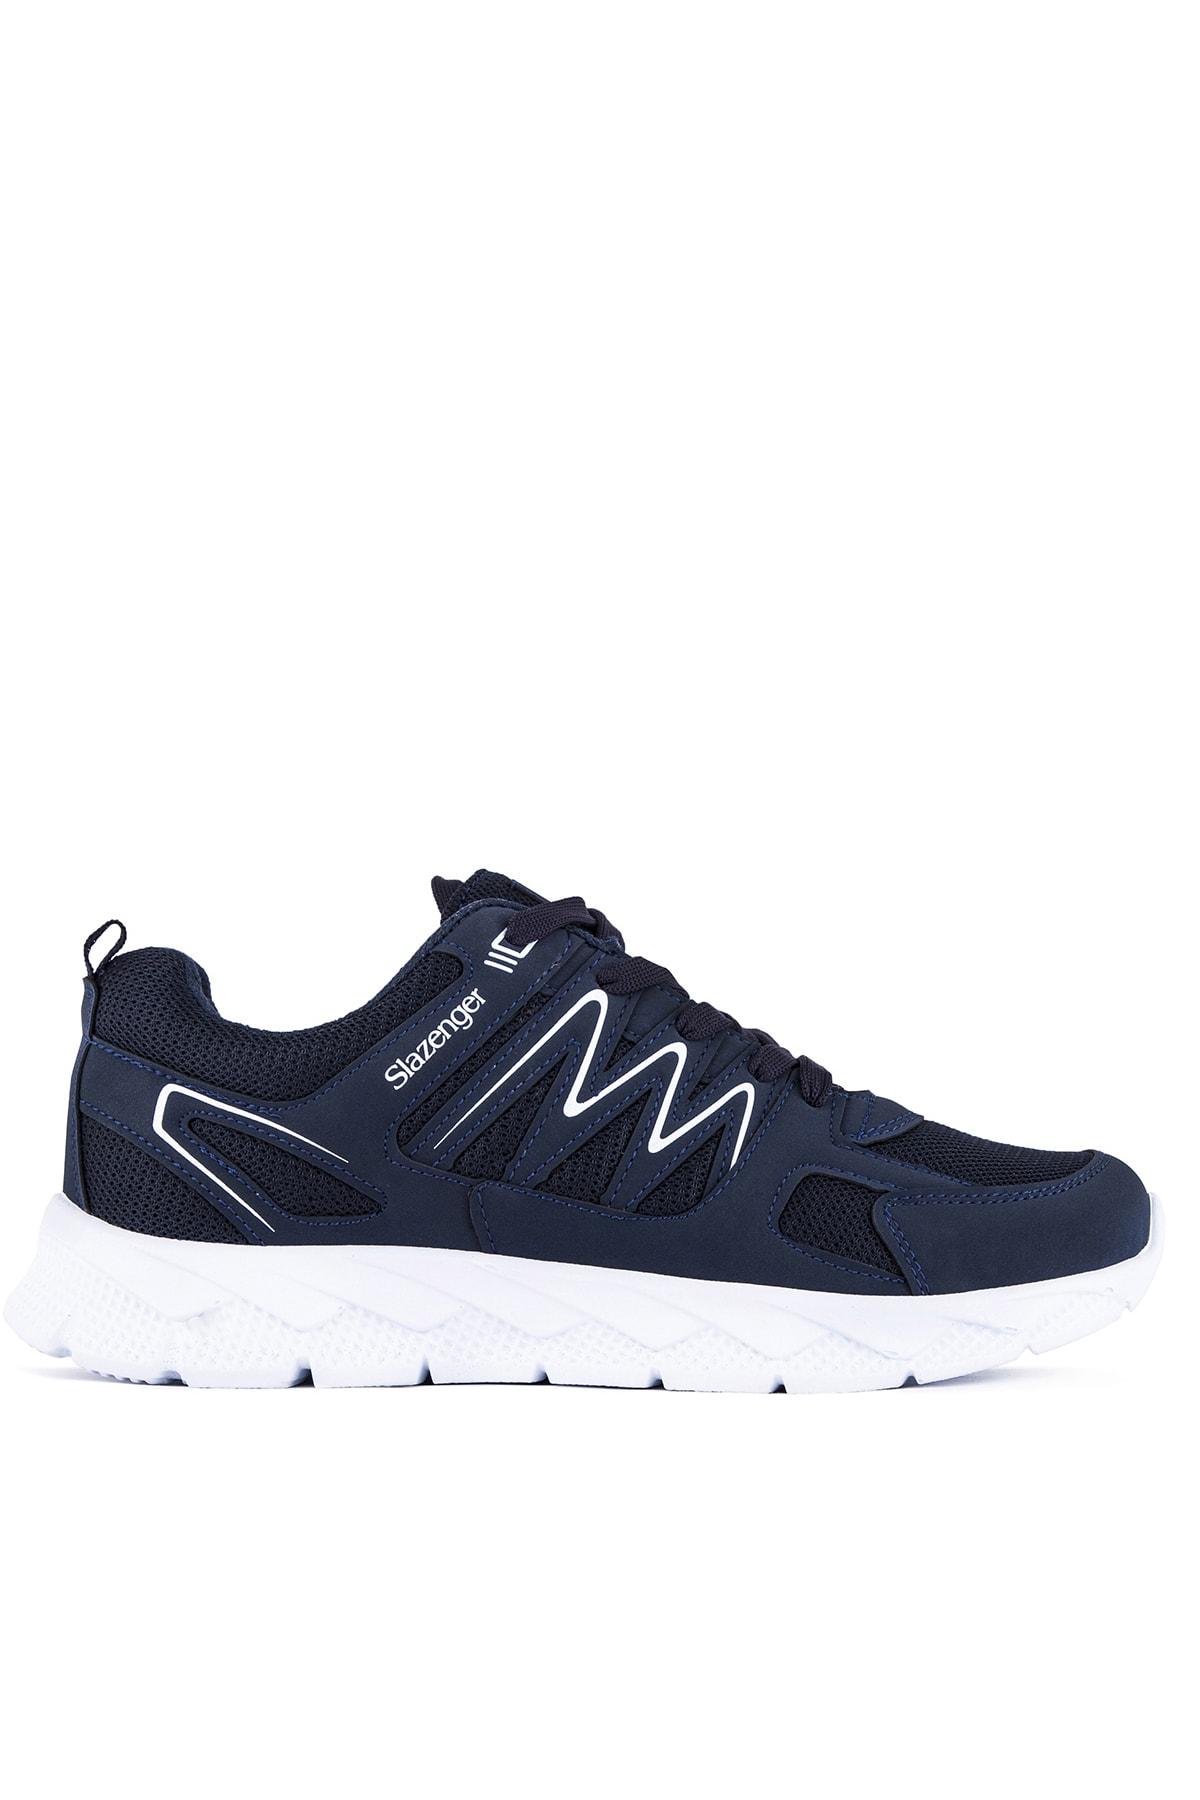 Krom Sneaker Unisex Ayakkabı Lacivert Sa11re240